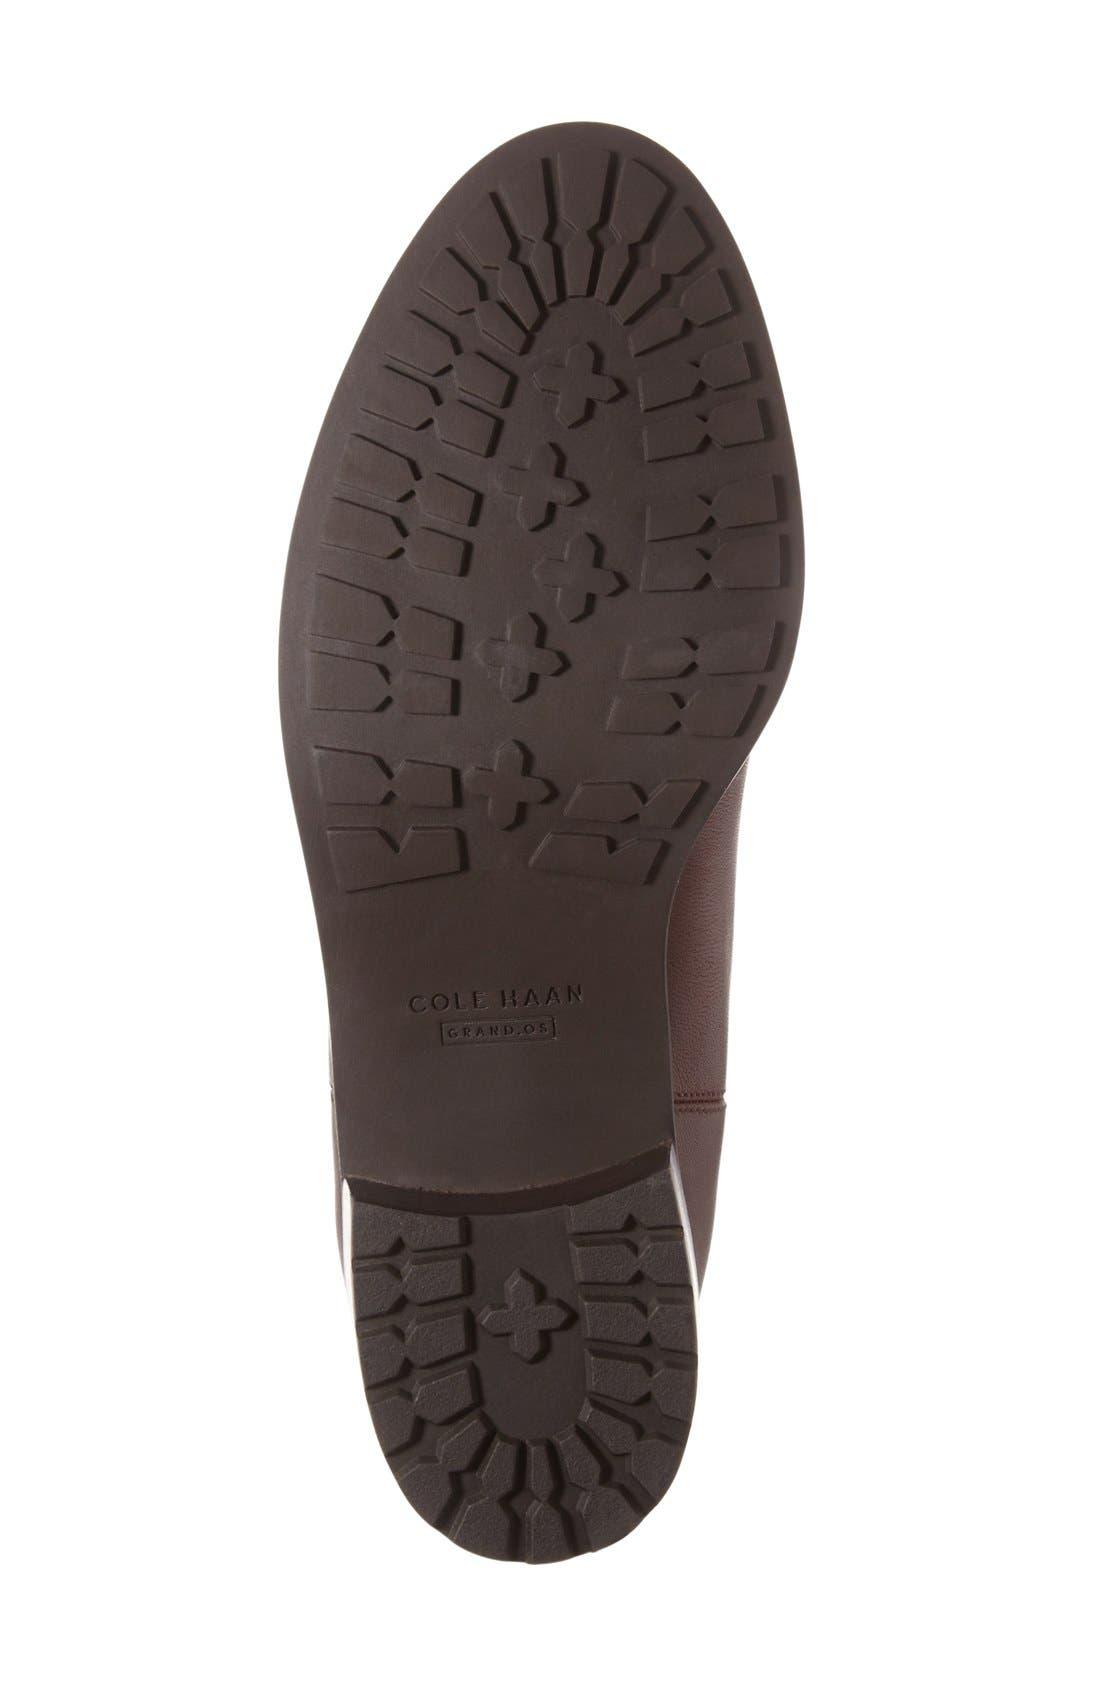 COLE HAAN, Newburg Waterproof Chelsea Boot, Alternate thumbnail 4, color, CHESTNUT LEATHER